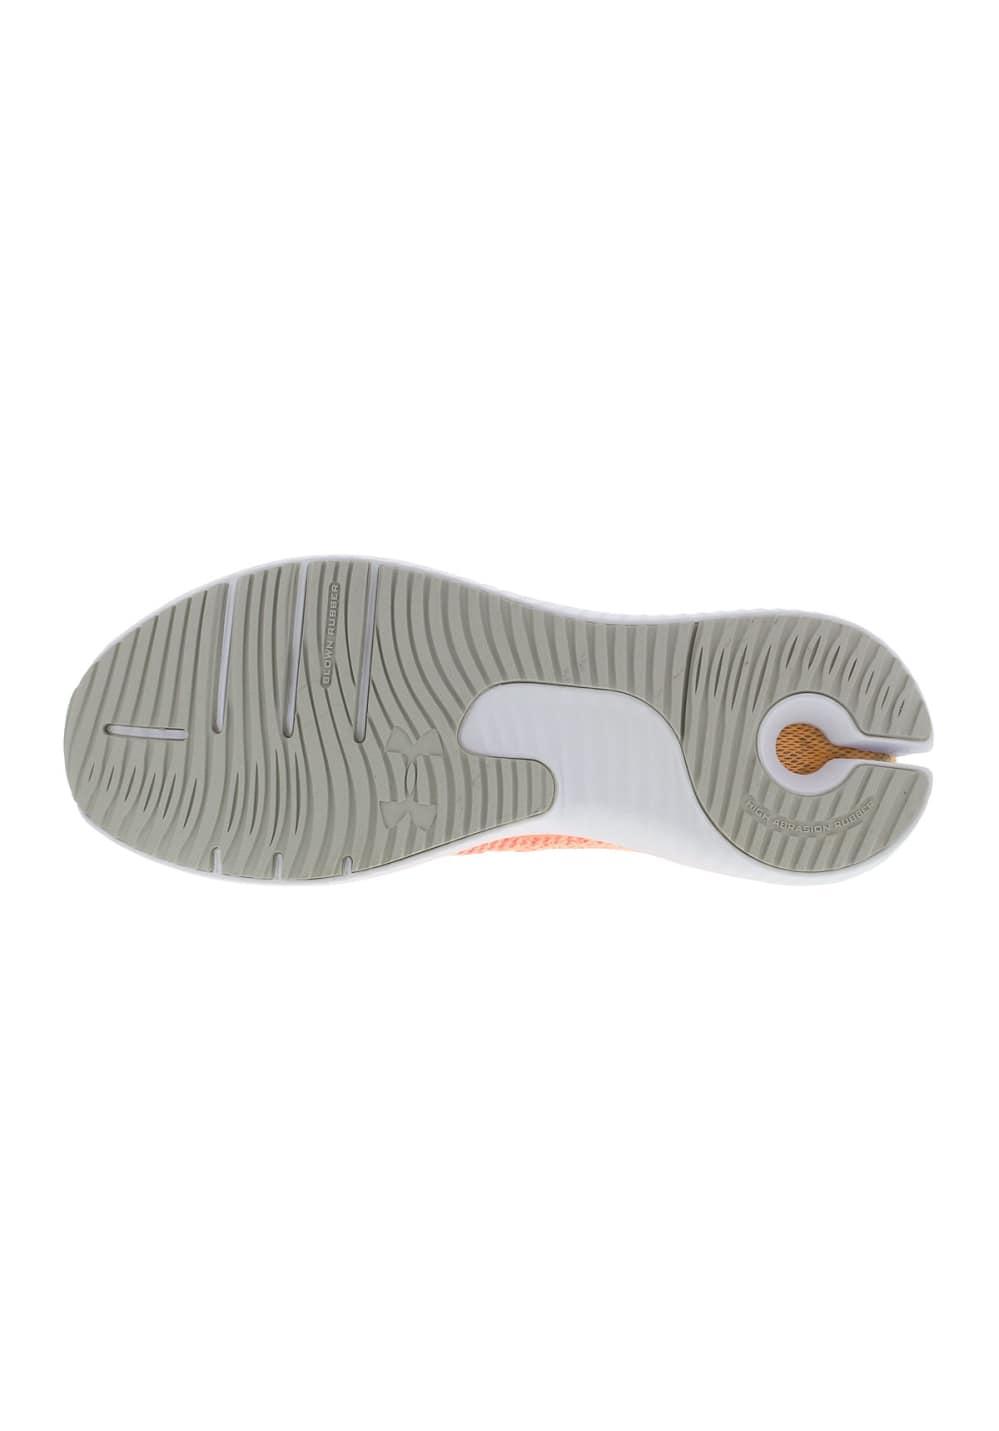 cb1e97f573 Under Armour Threadborne Blur - Running shoes for Women - Orange